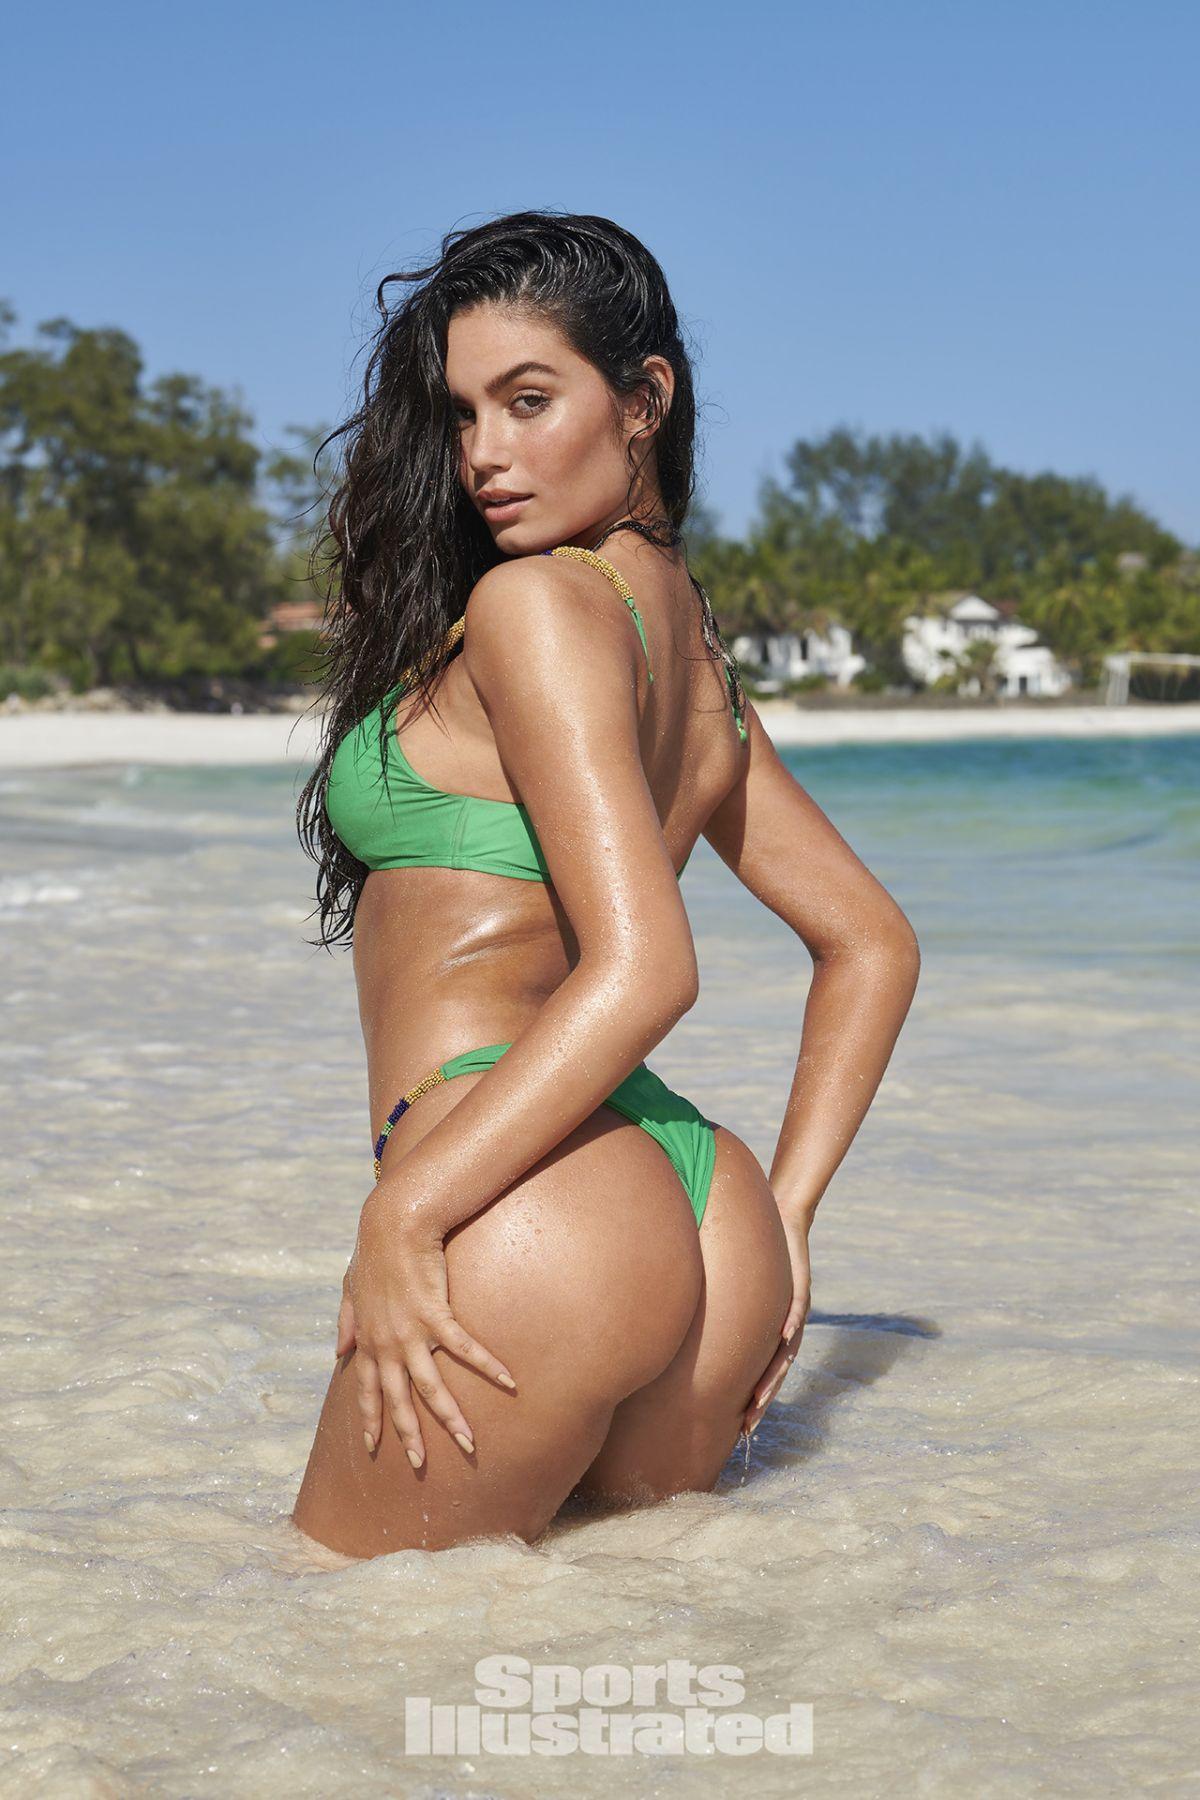 swimsuit paula anne illustrated sports si tsai issue bikini yu photoshoot hawtcelebs kenya celebrities vix hermanny latest